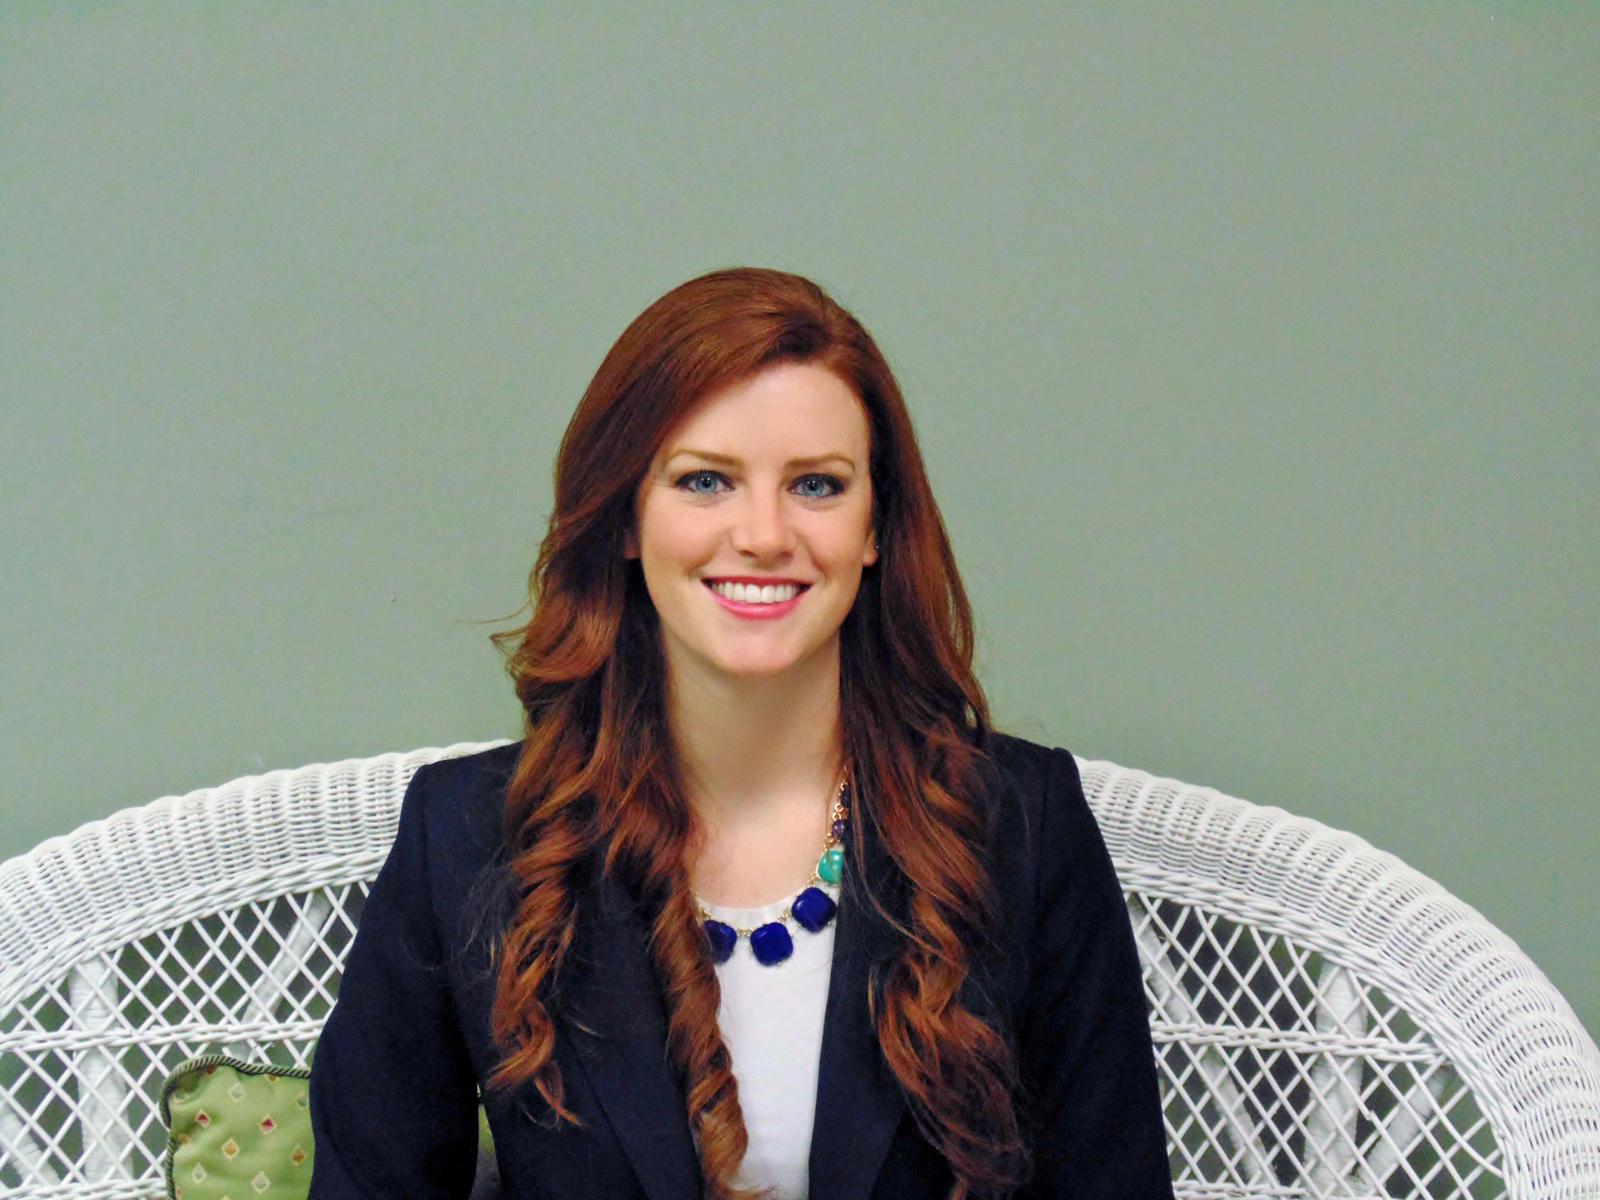 Jessica Adkins Marketing Director ext 231 jadkins@accessii.org